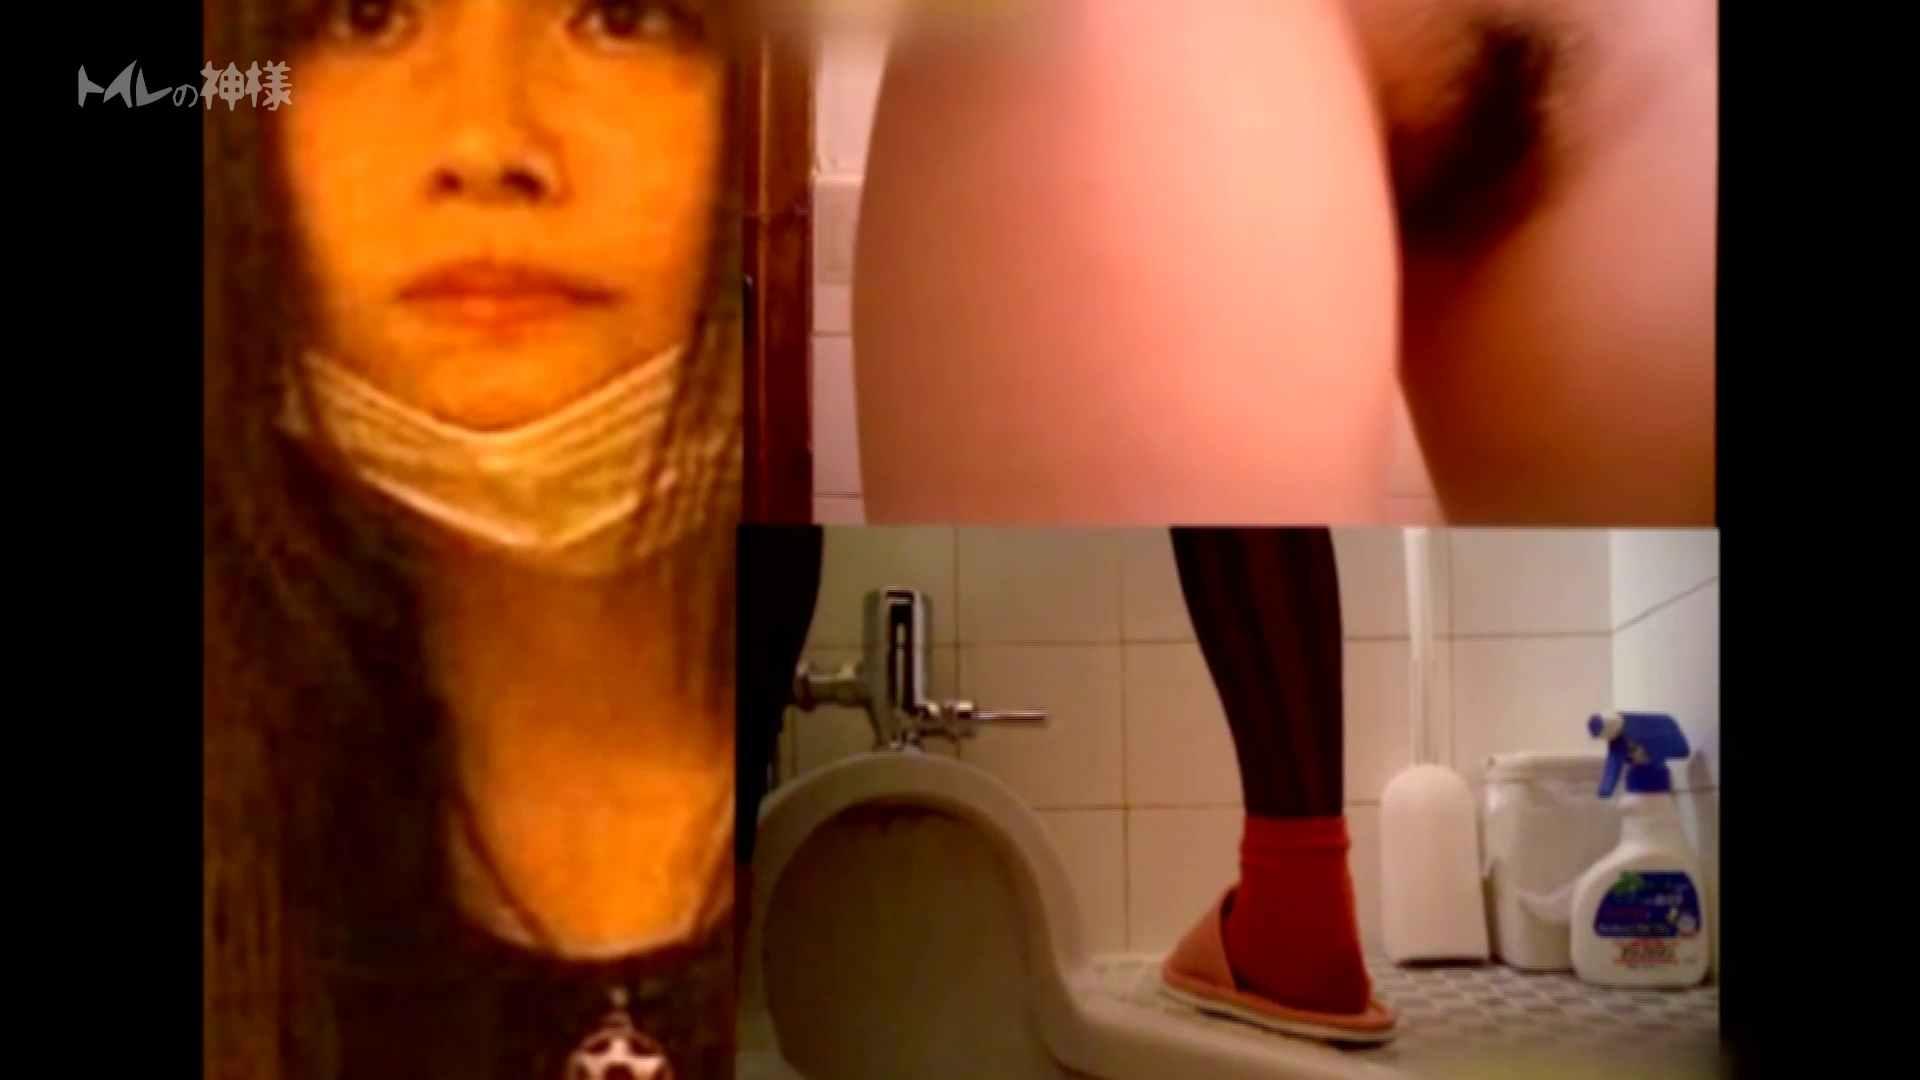 Vol.02 花の女子大生うんこ盗撮2 トイレ盗撮 AV無料動画キャプチャ 92枚 6